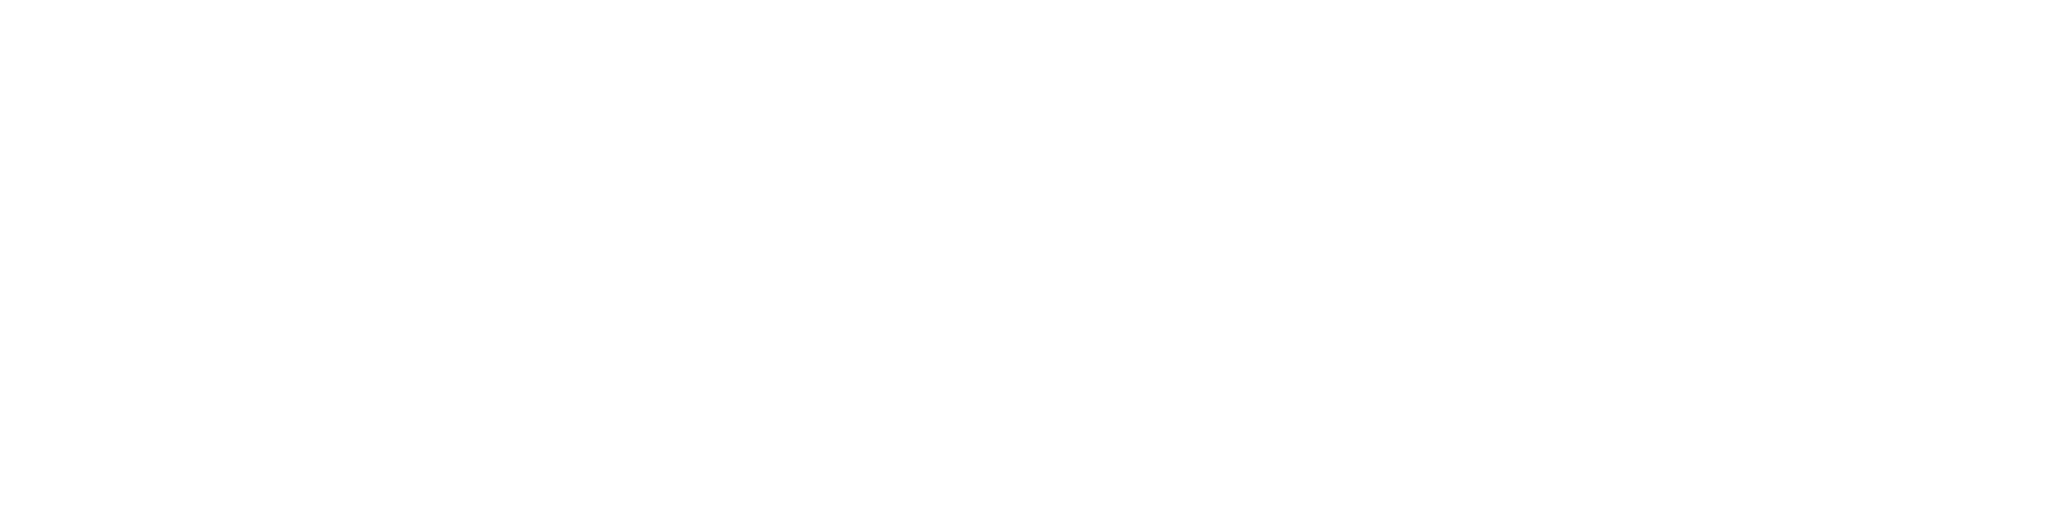 Oakwood at Nocatee-white